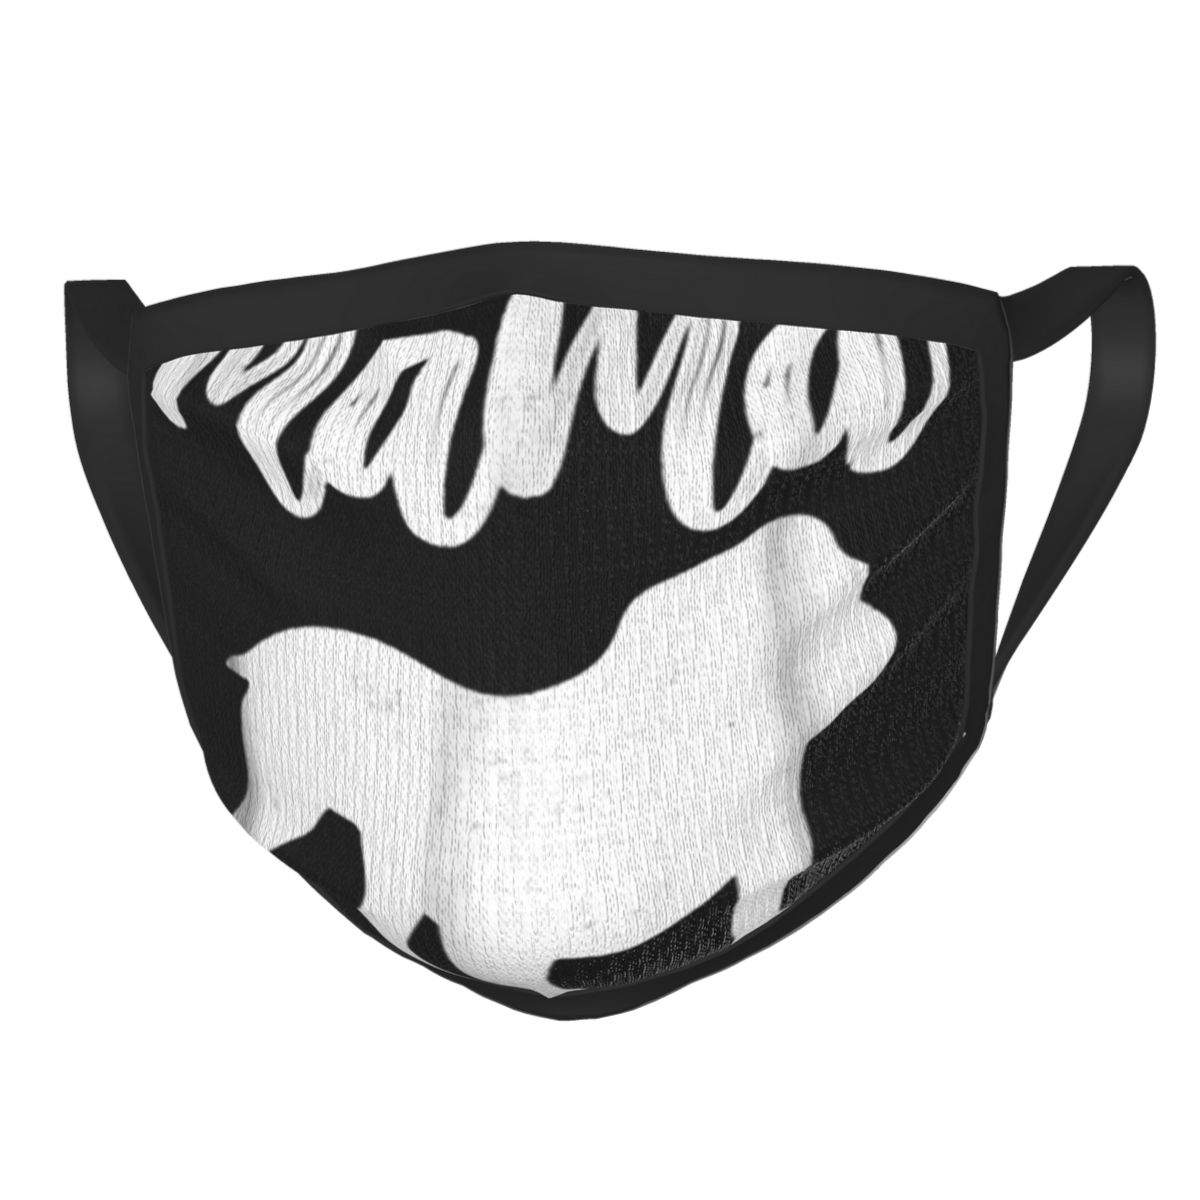 Top Old English Bulldog Mama Gifts For Mother Better Drop Shipping Новое поступление музыкальная маска Harajuku